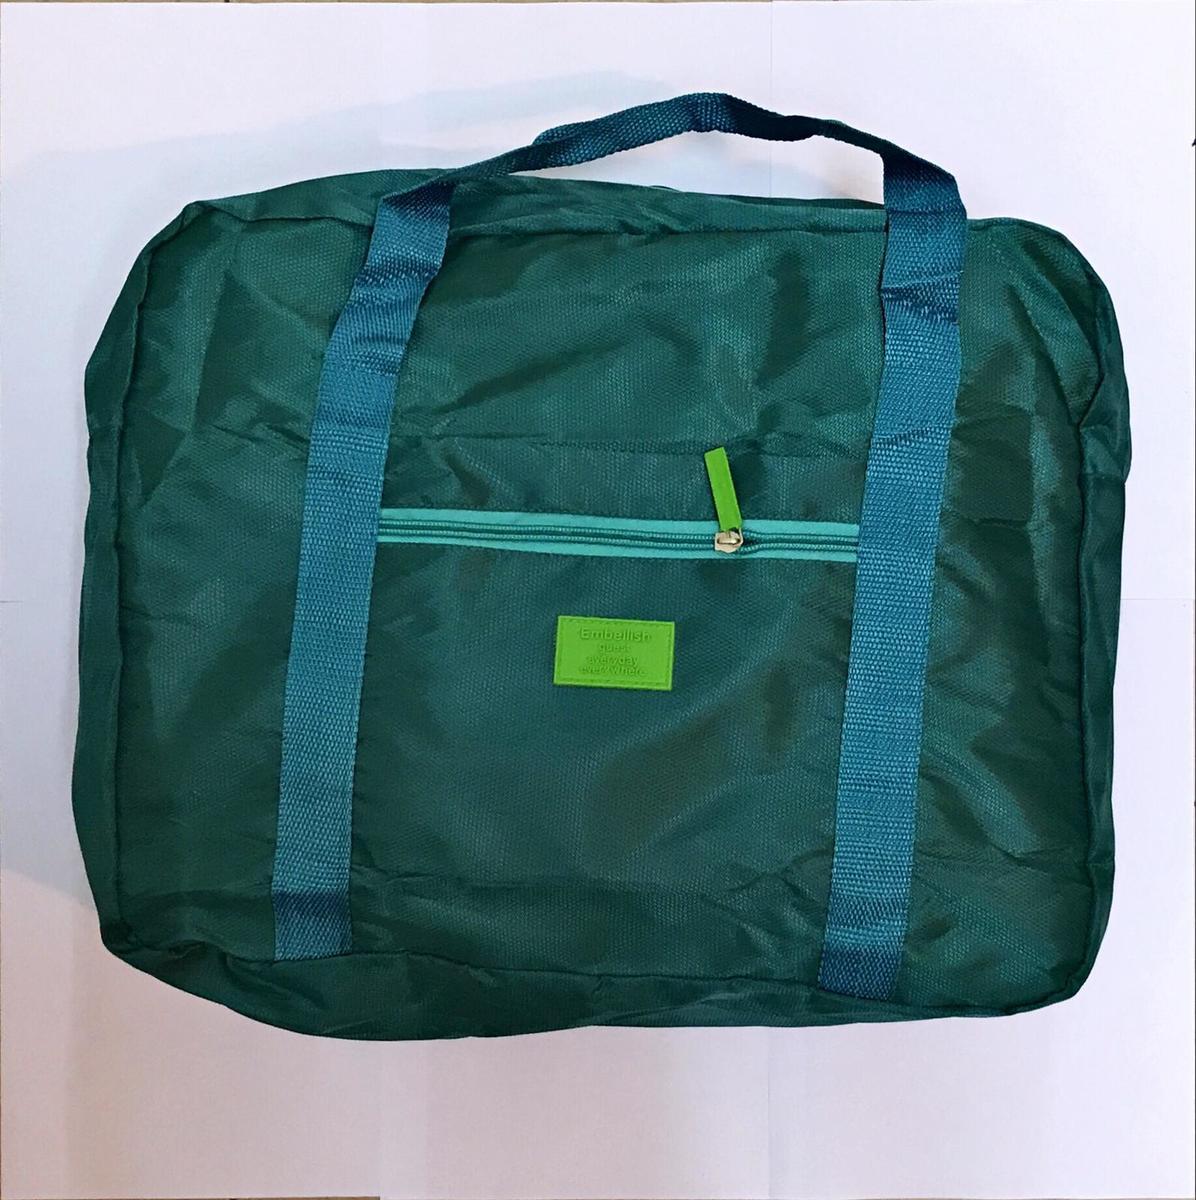 (Green) Korean Style Foldable Large Capacity Luggage Pull Handle Travel Bag